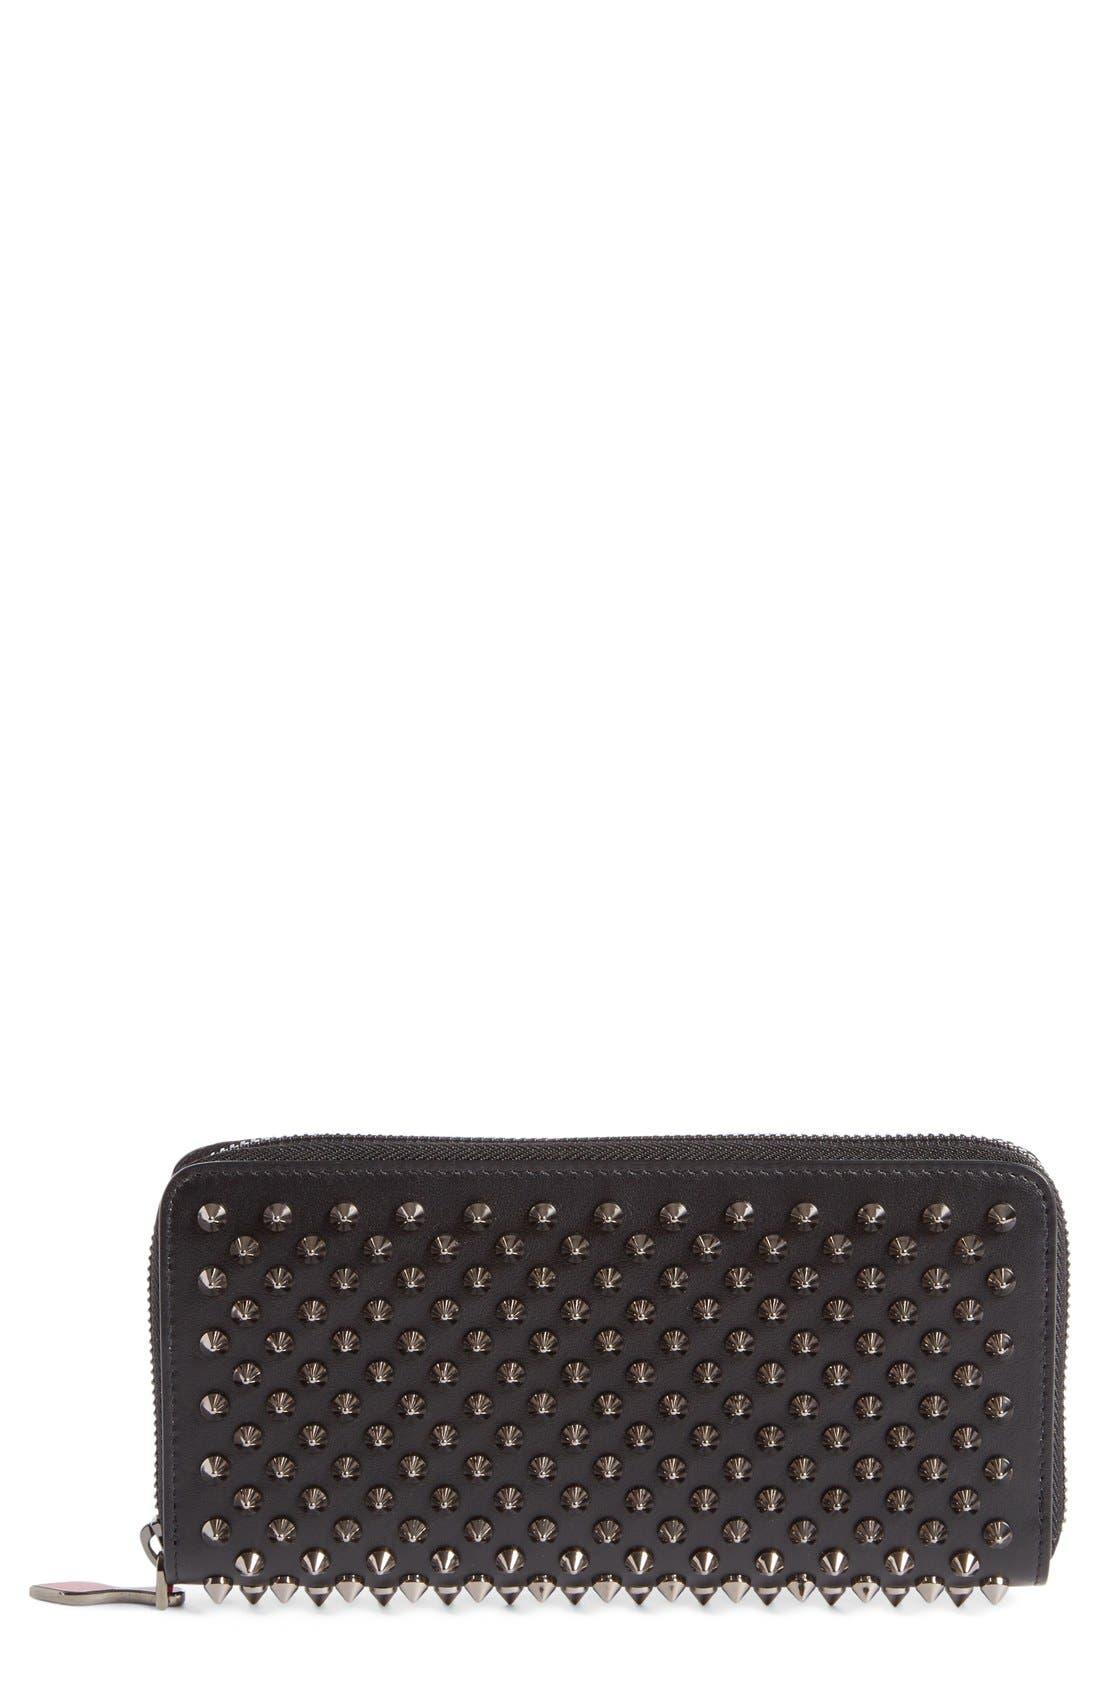 Panettone Spiked Calfskin Wallet,                         Main,                         color, BLACK/GUN METAL